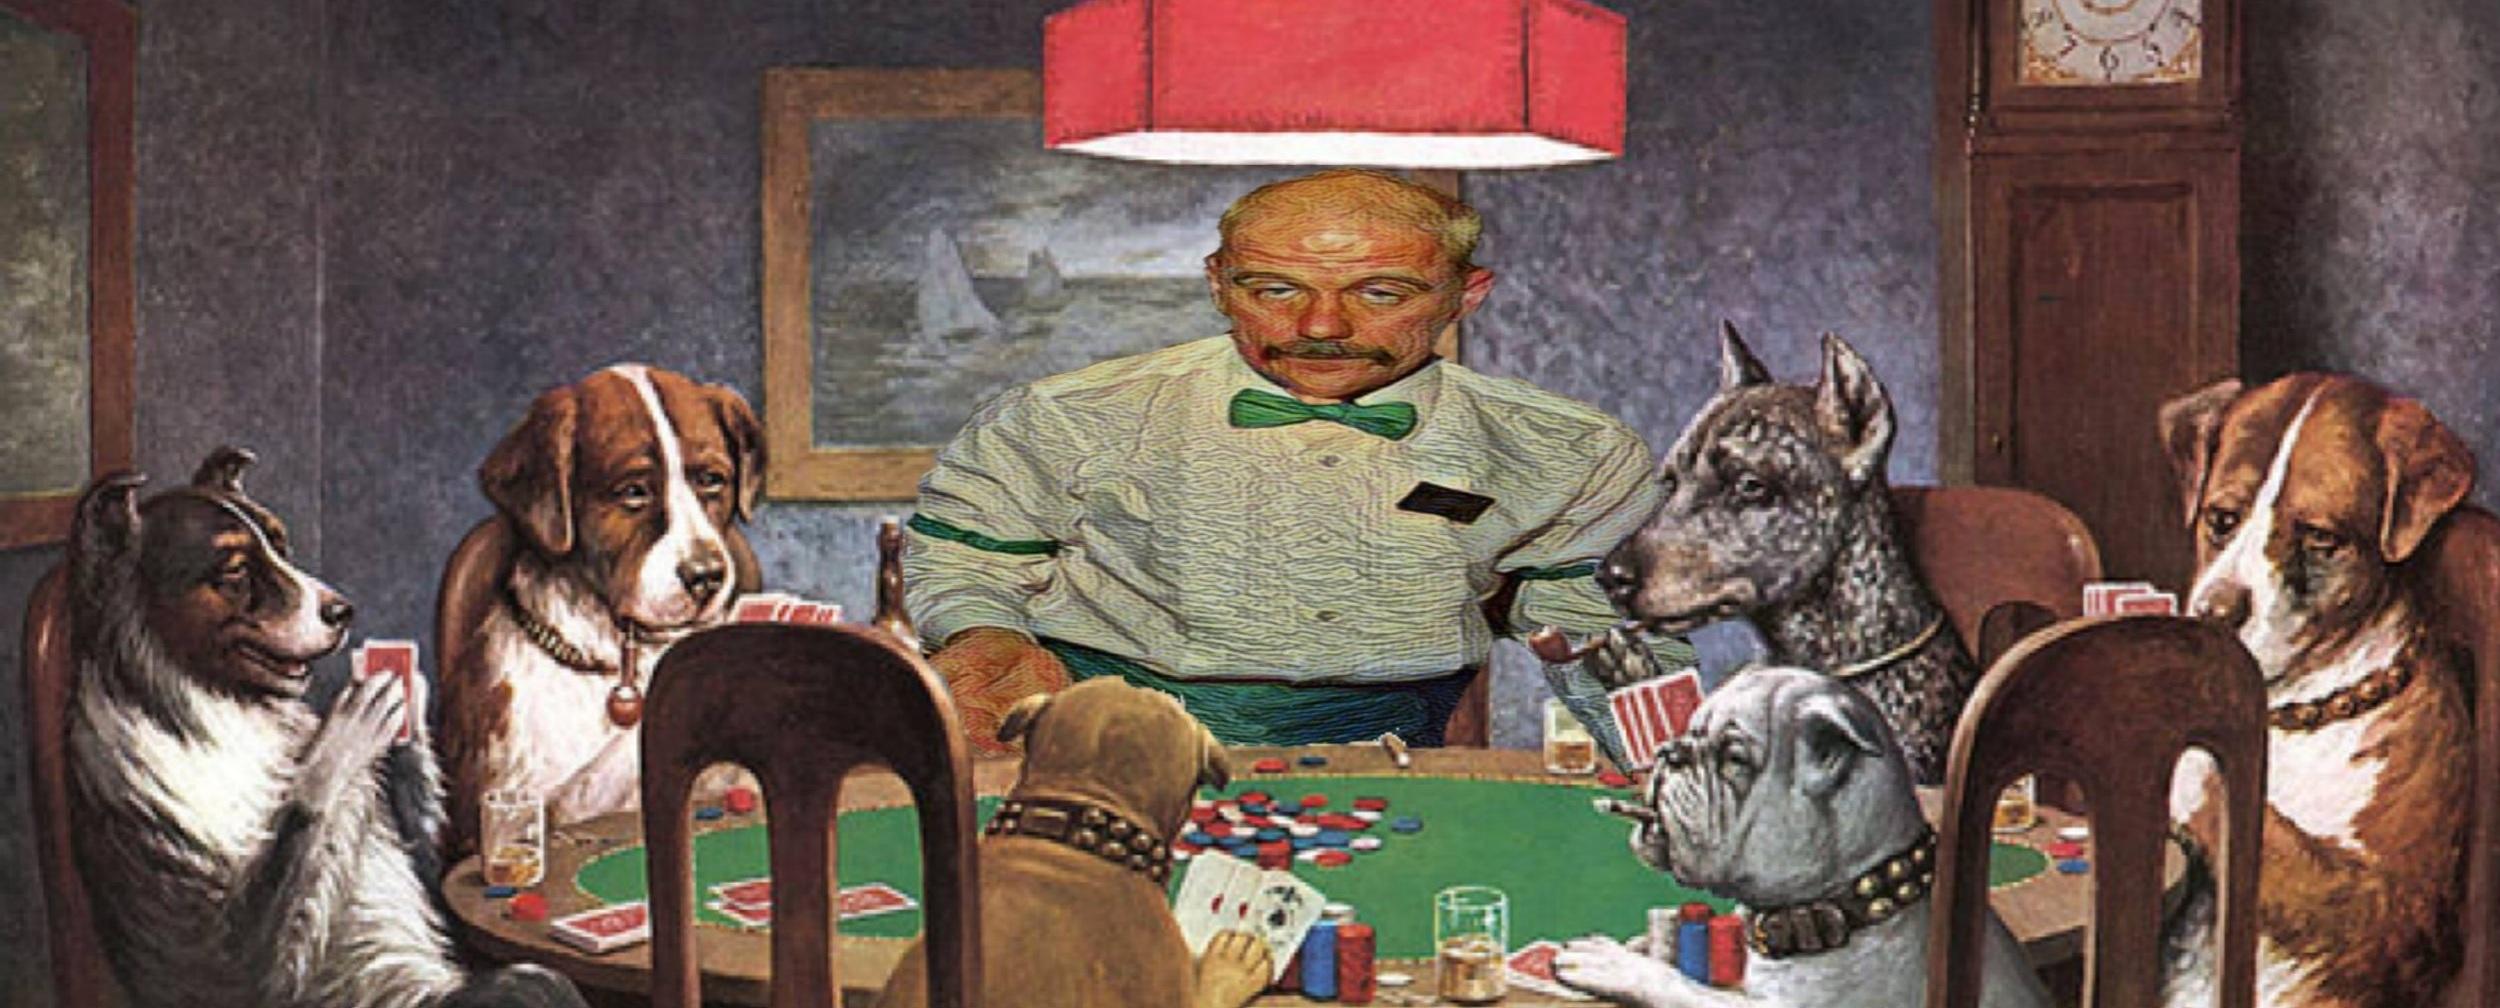 an improvisational blackjack experience